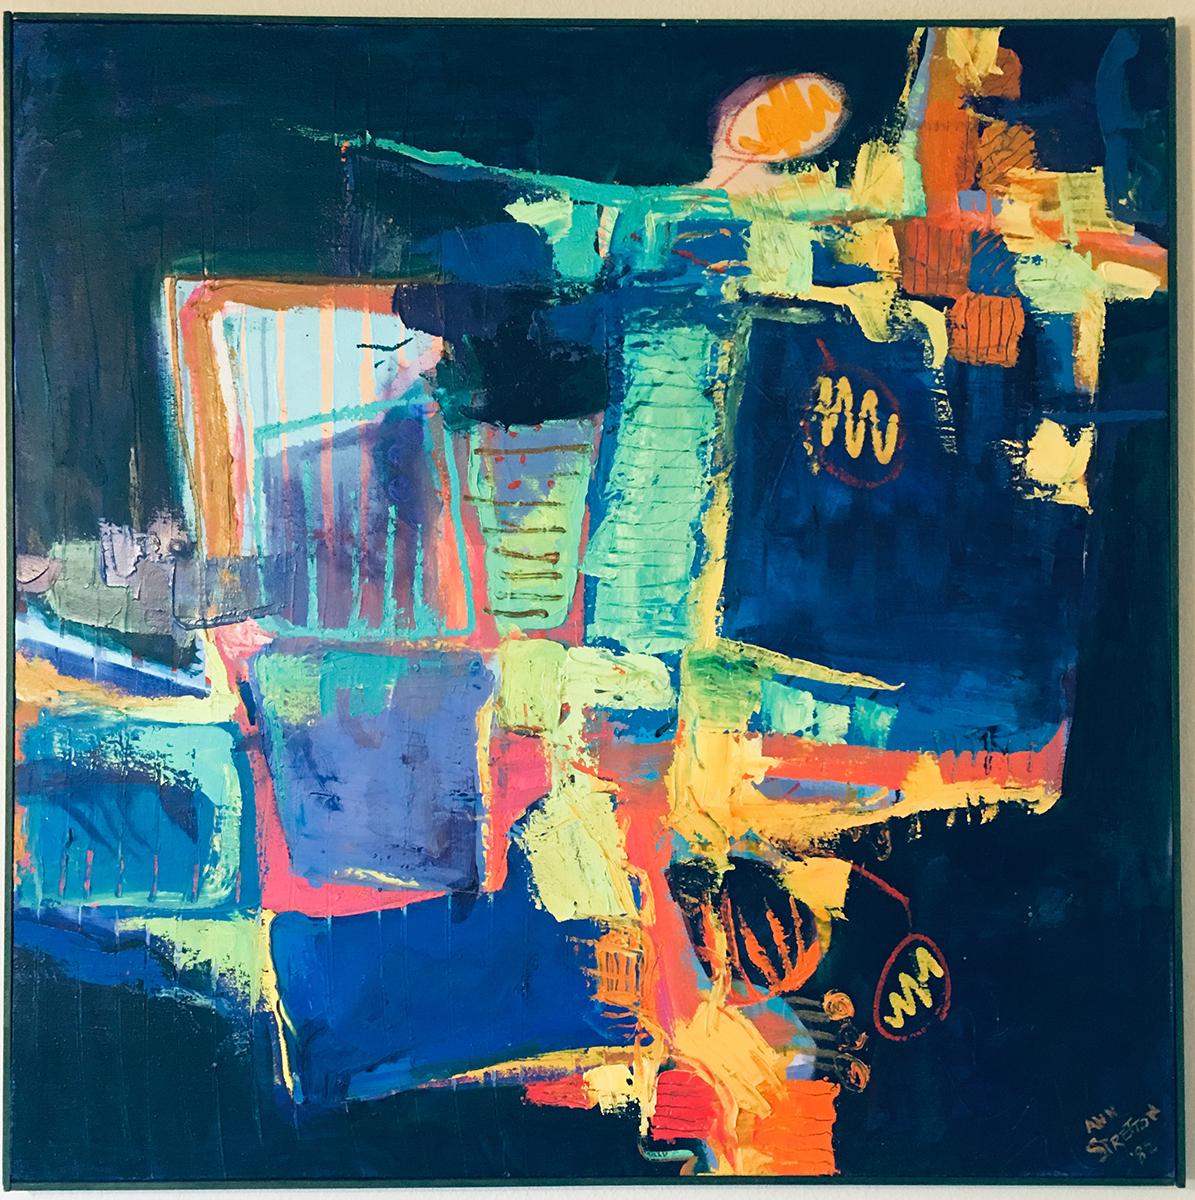 Untitled, Oil and Acrylic, 1982, Ann Stretton